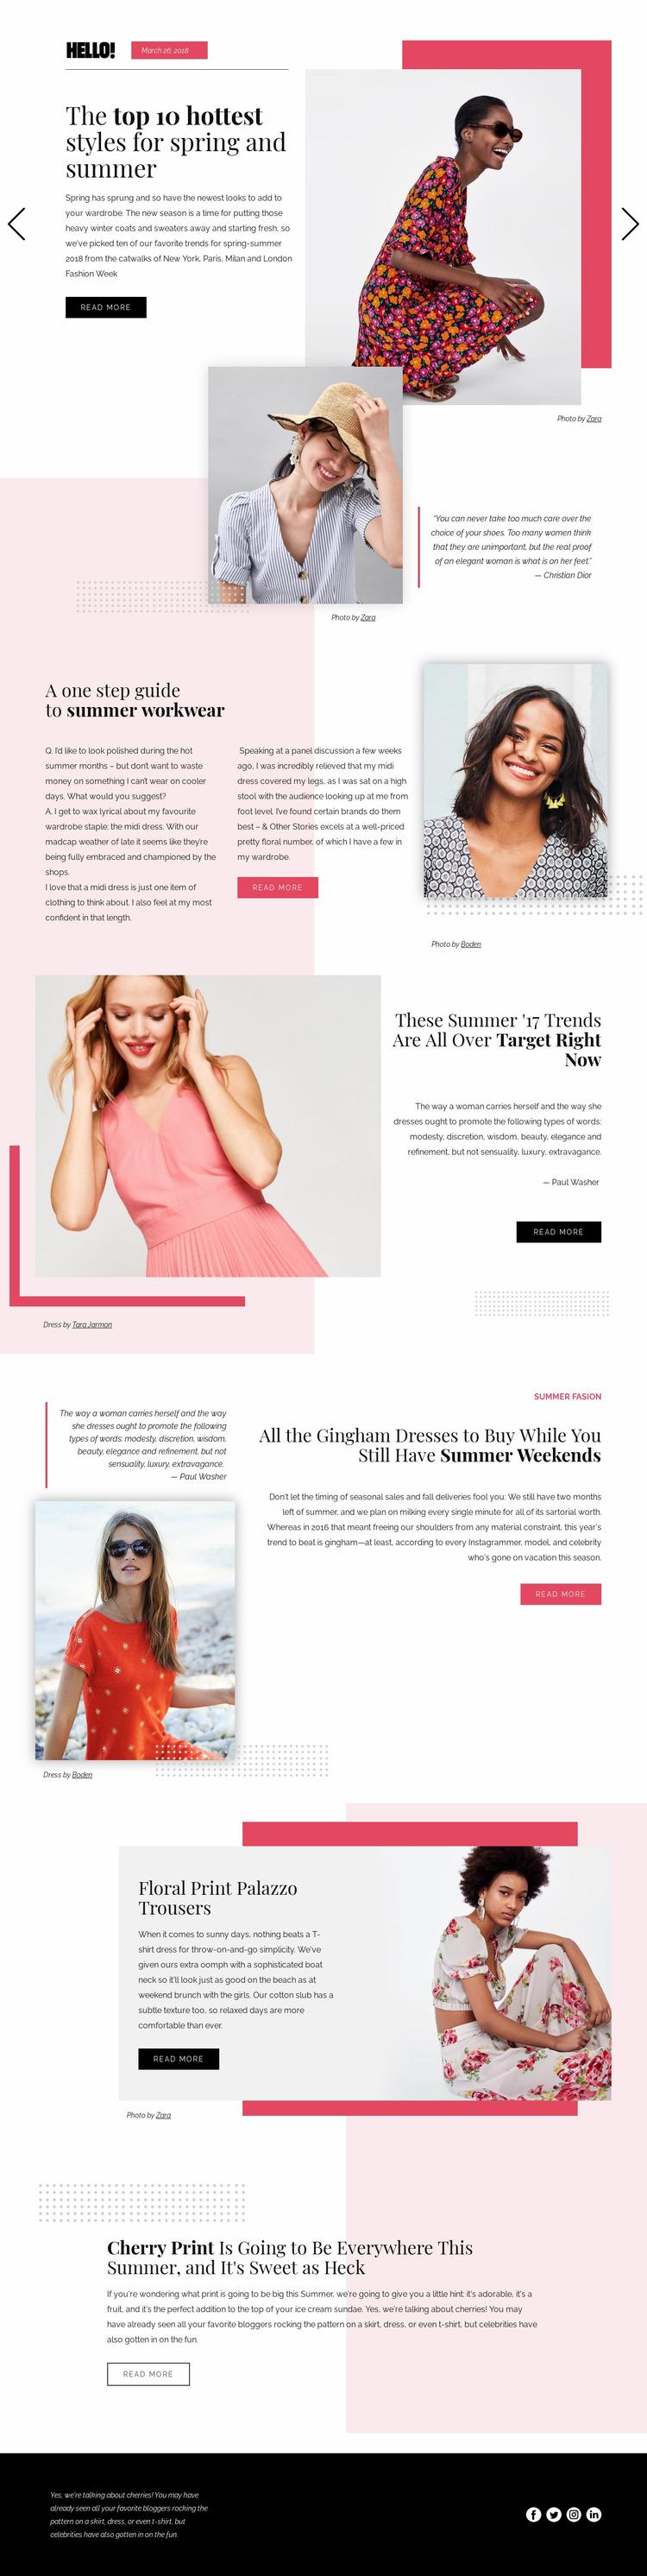 Fashion Trends Website Mockup